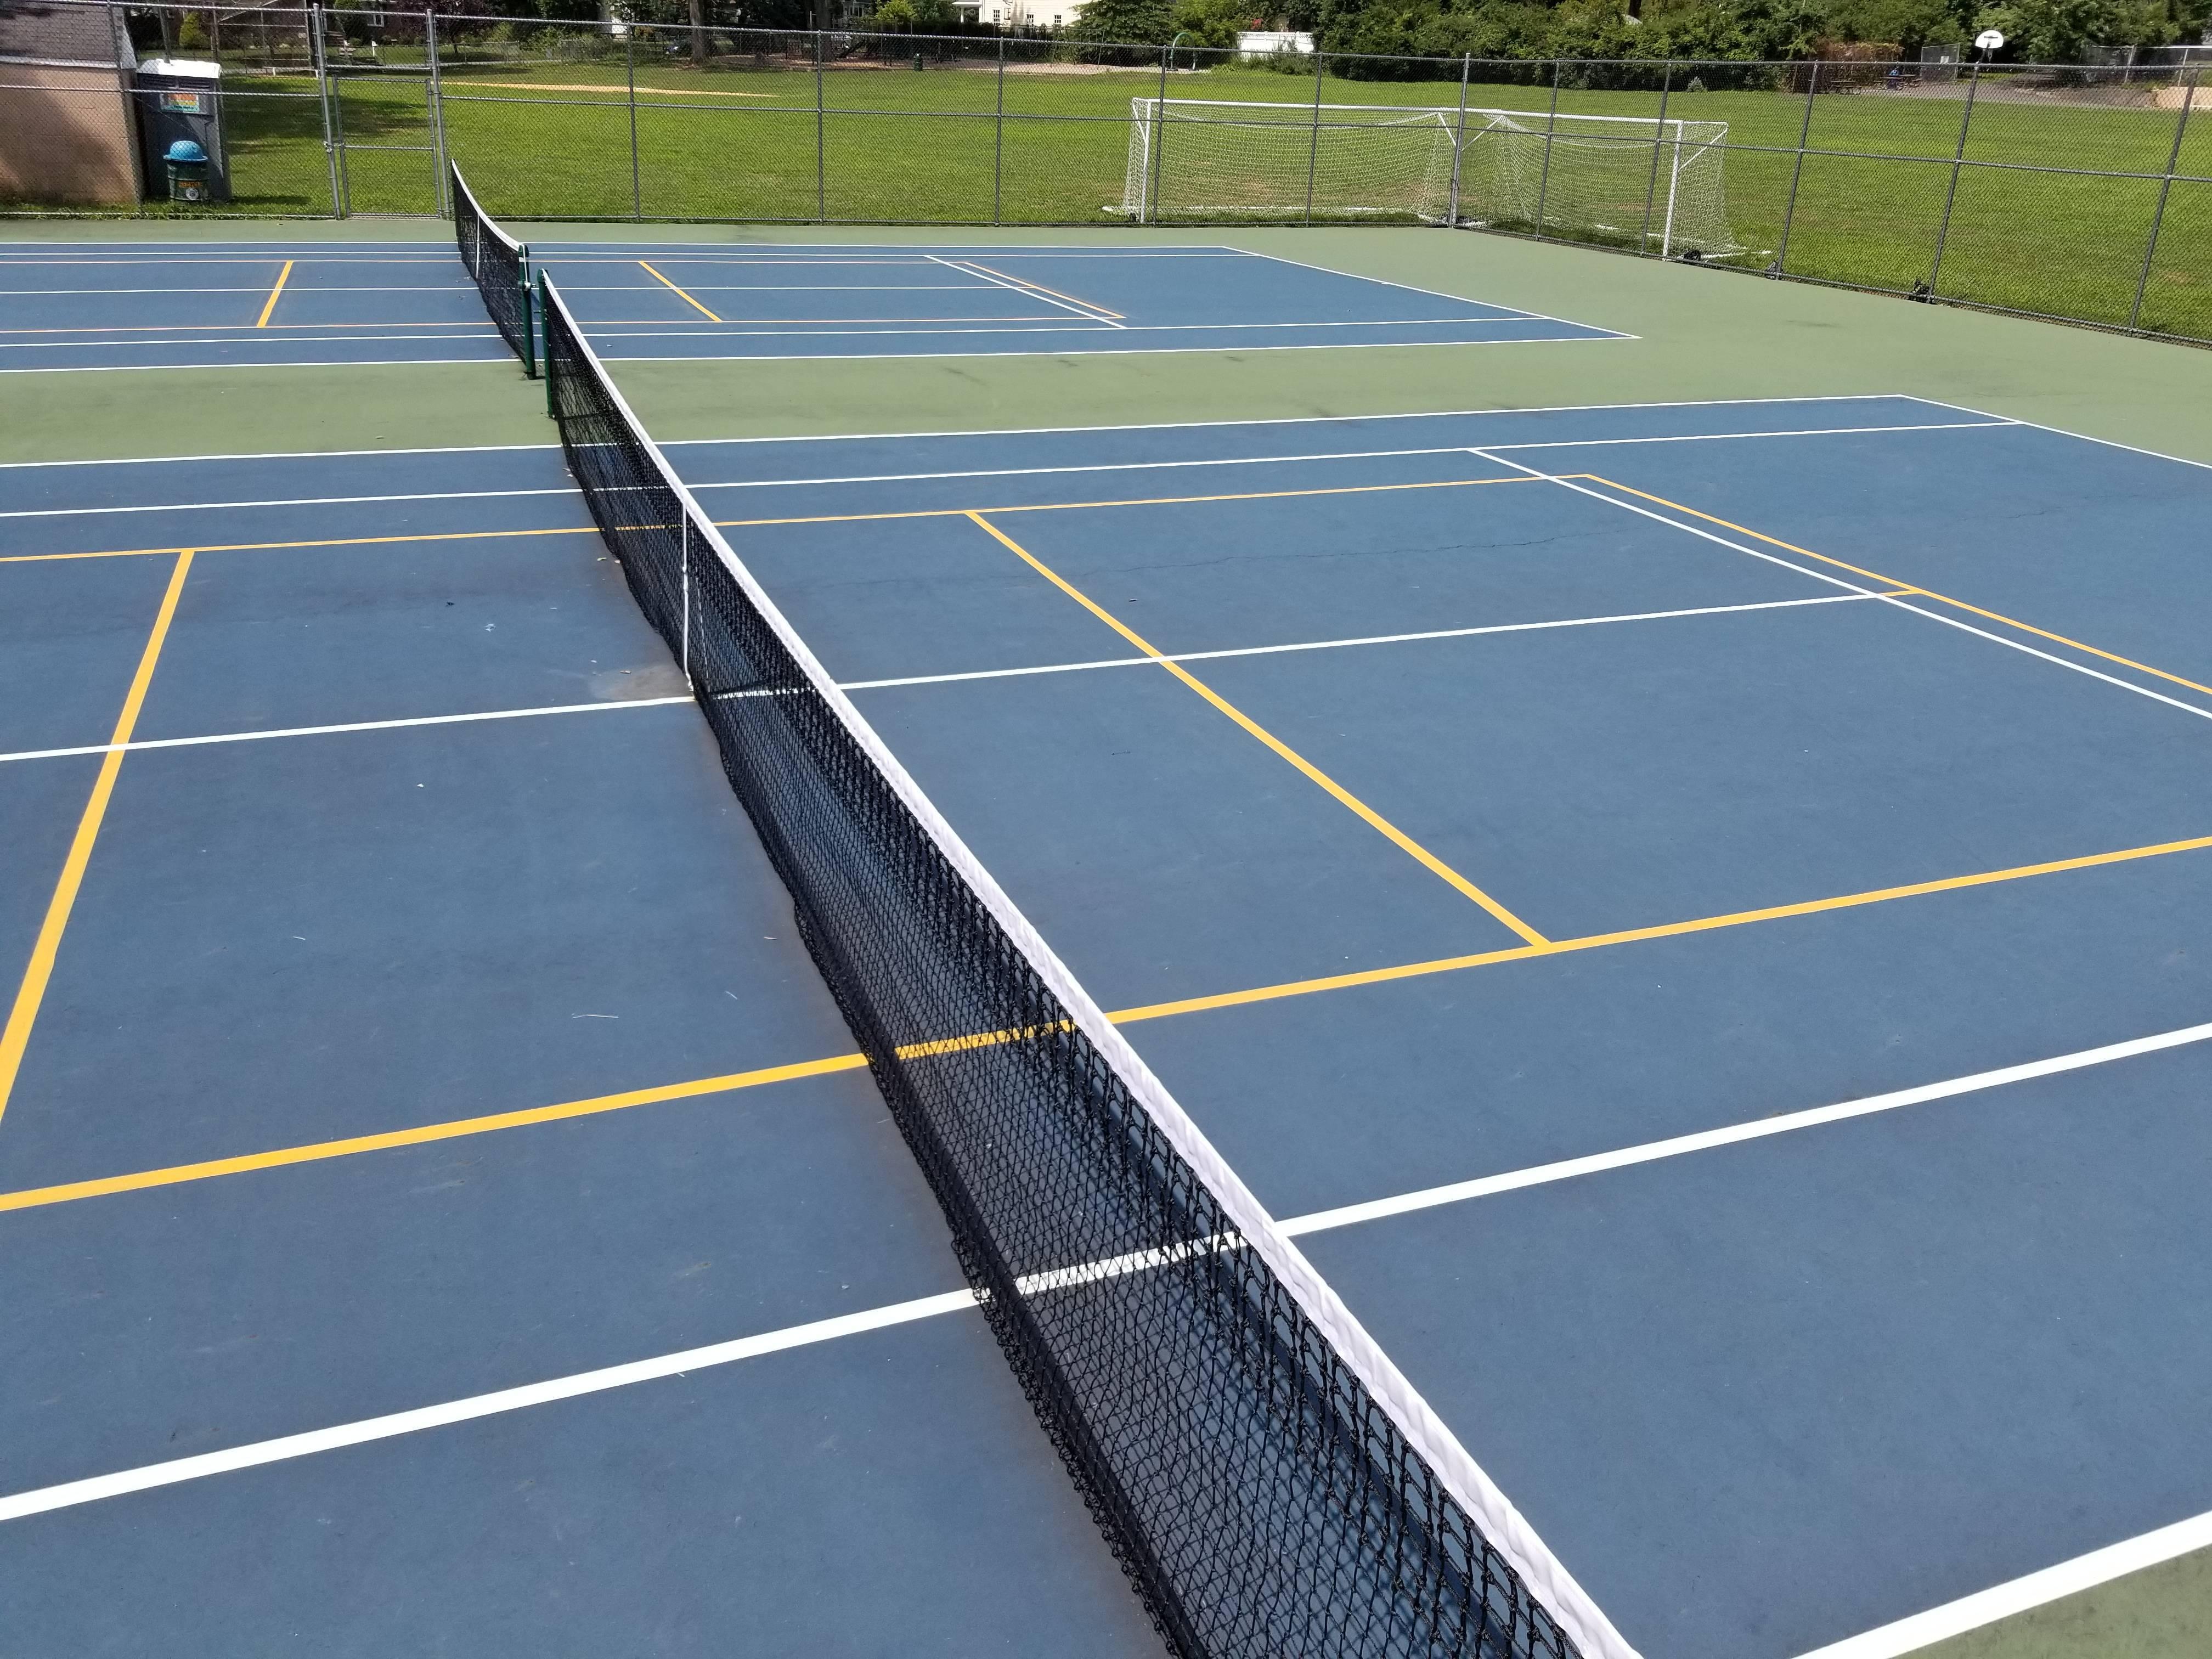 ad1b30cea476501c0787_Slayton_Field_Tennis_Courts-Pickelball_Courts.jpg